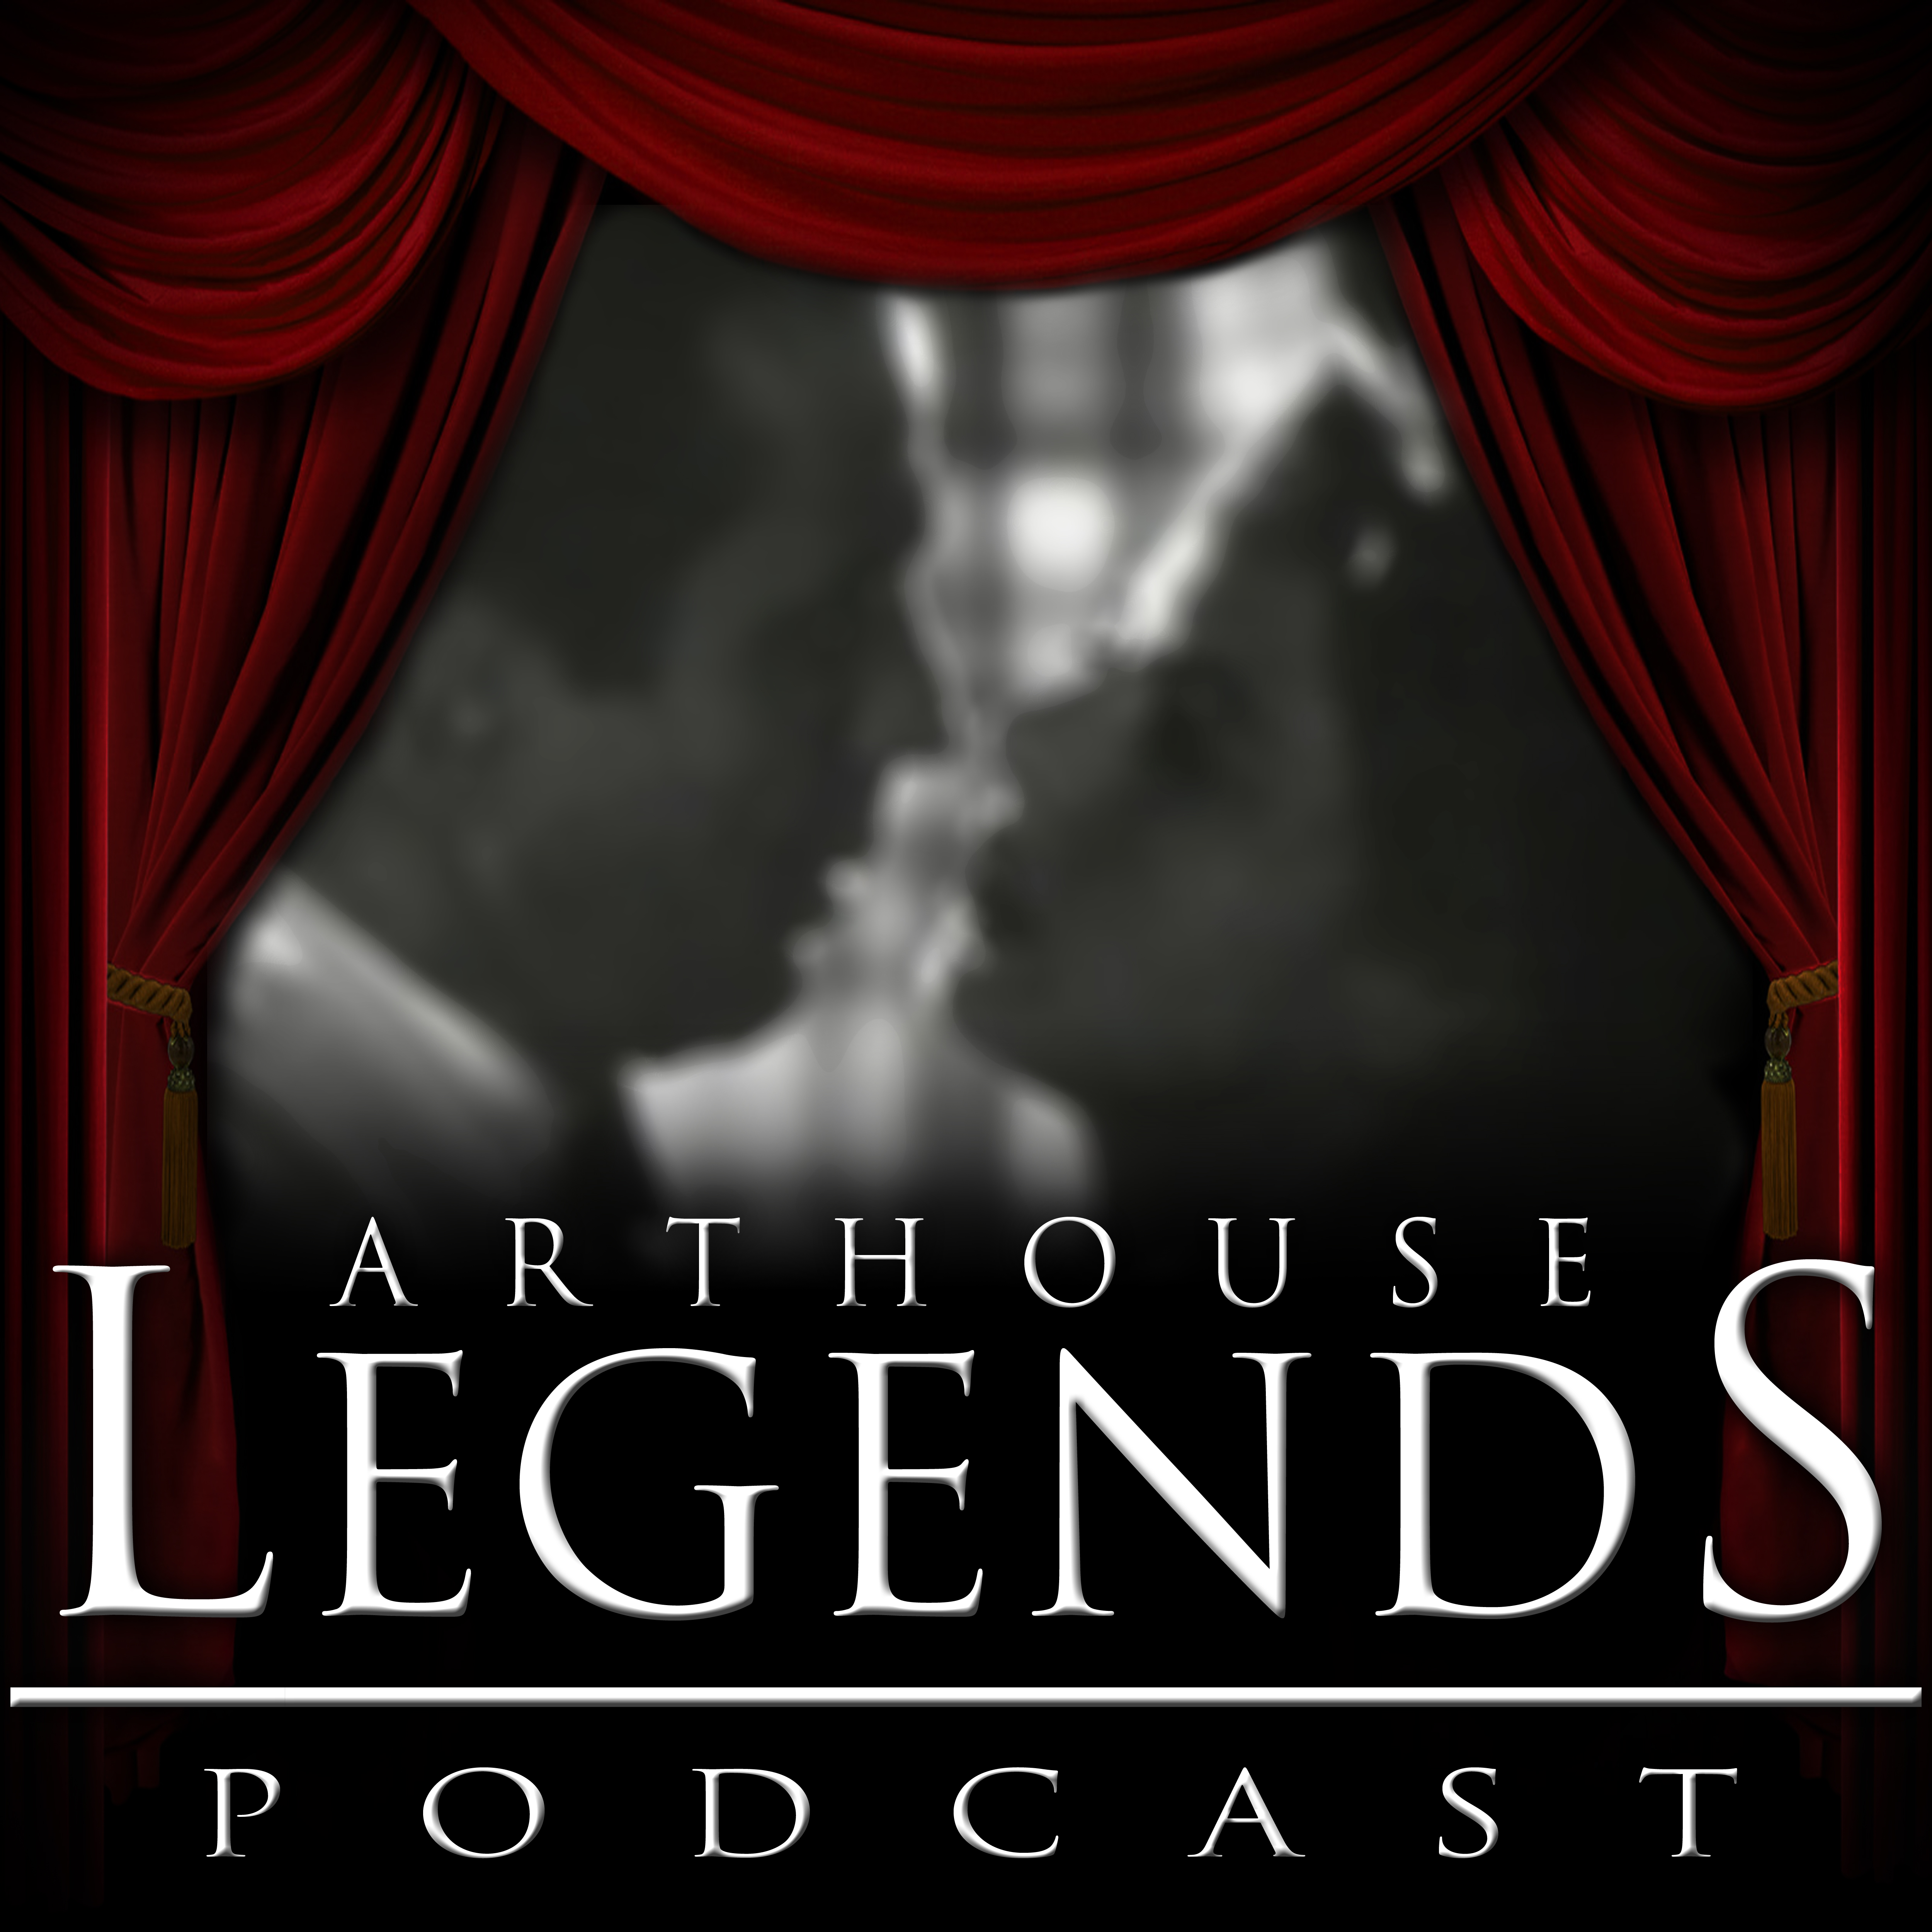 Arthouse Legends Podcast show art